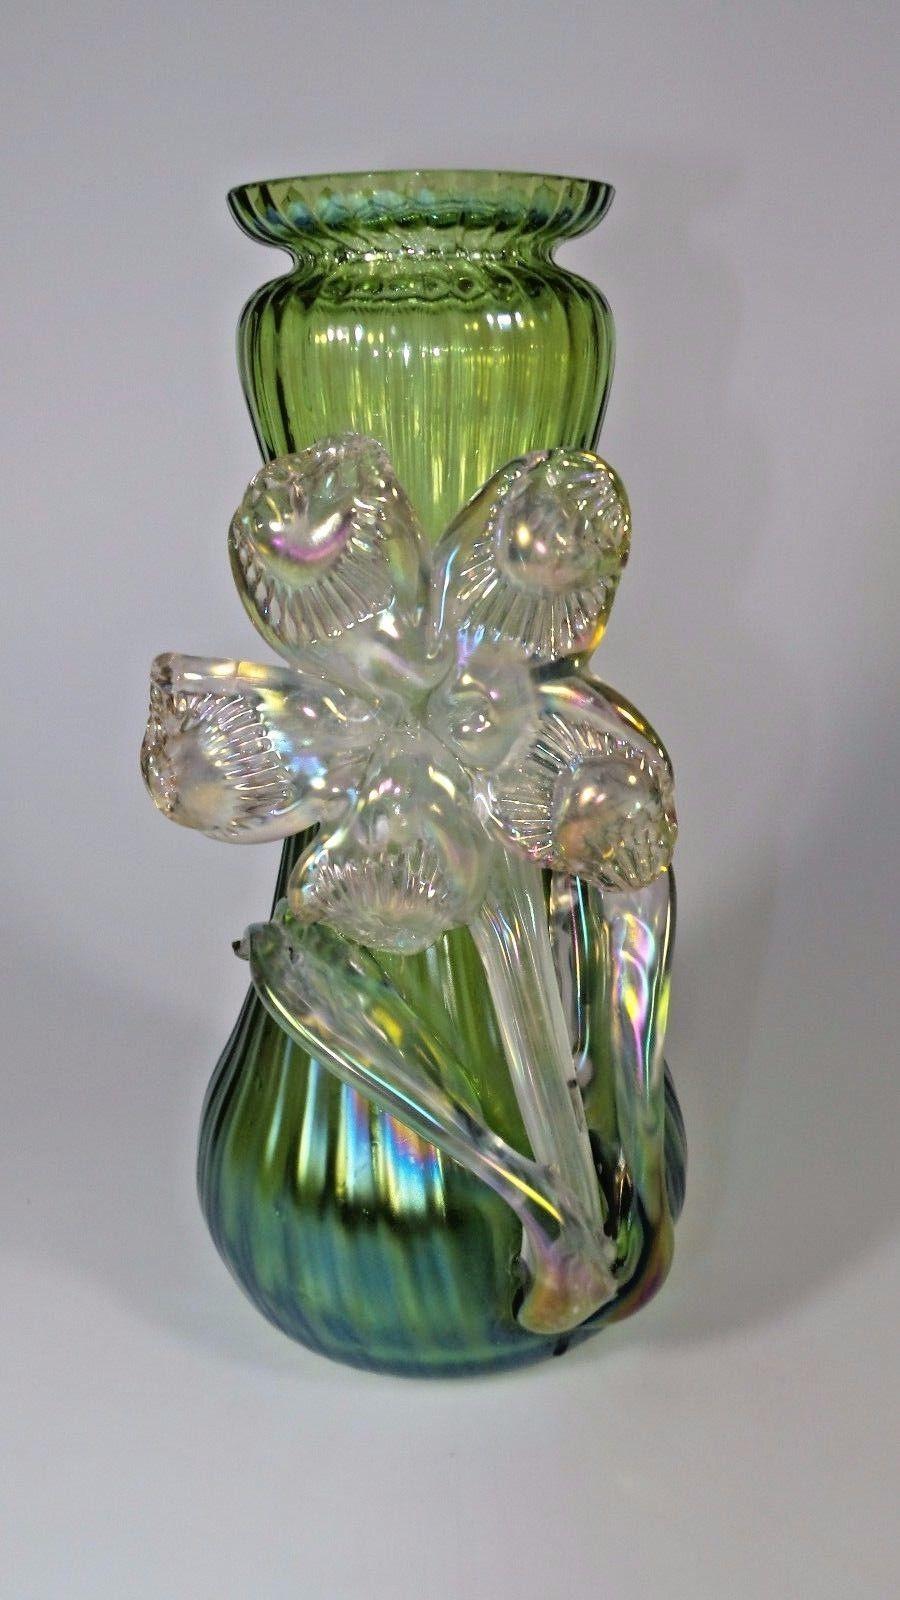 Kralik Glass Vase Of Vintage Art Nouveau Kralik Green Iridescent Art Glass Vase W Applied for Vintage Art Nouveau Kralik Green Iridescent Art Glass Vase W Applied Flower Pottery